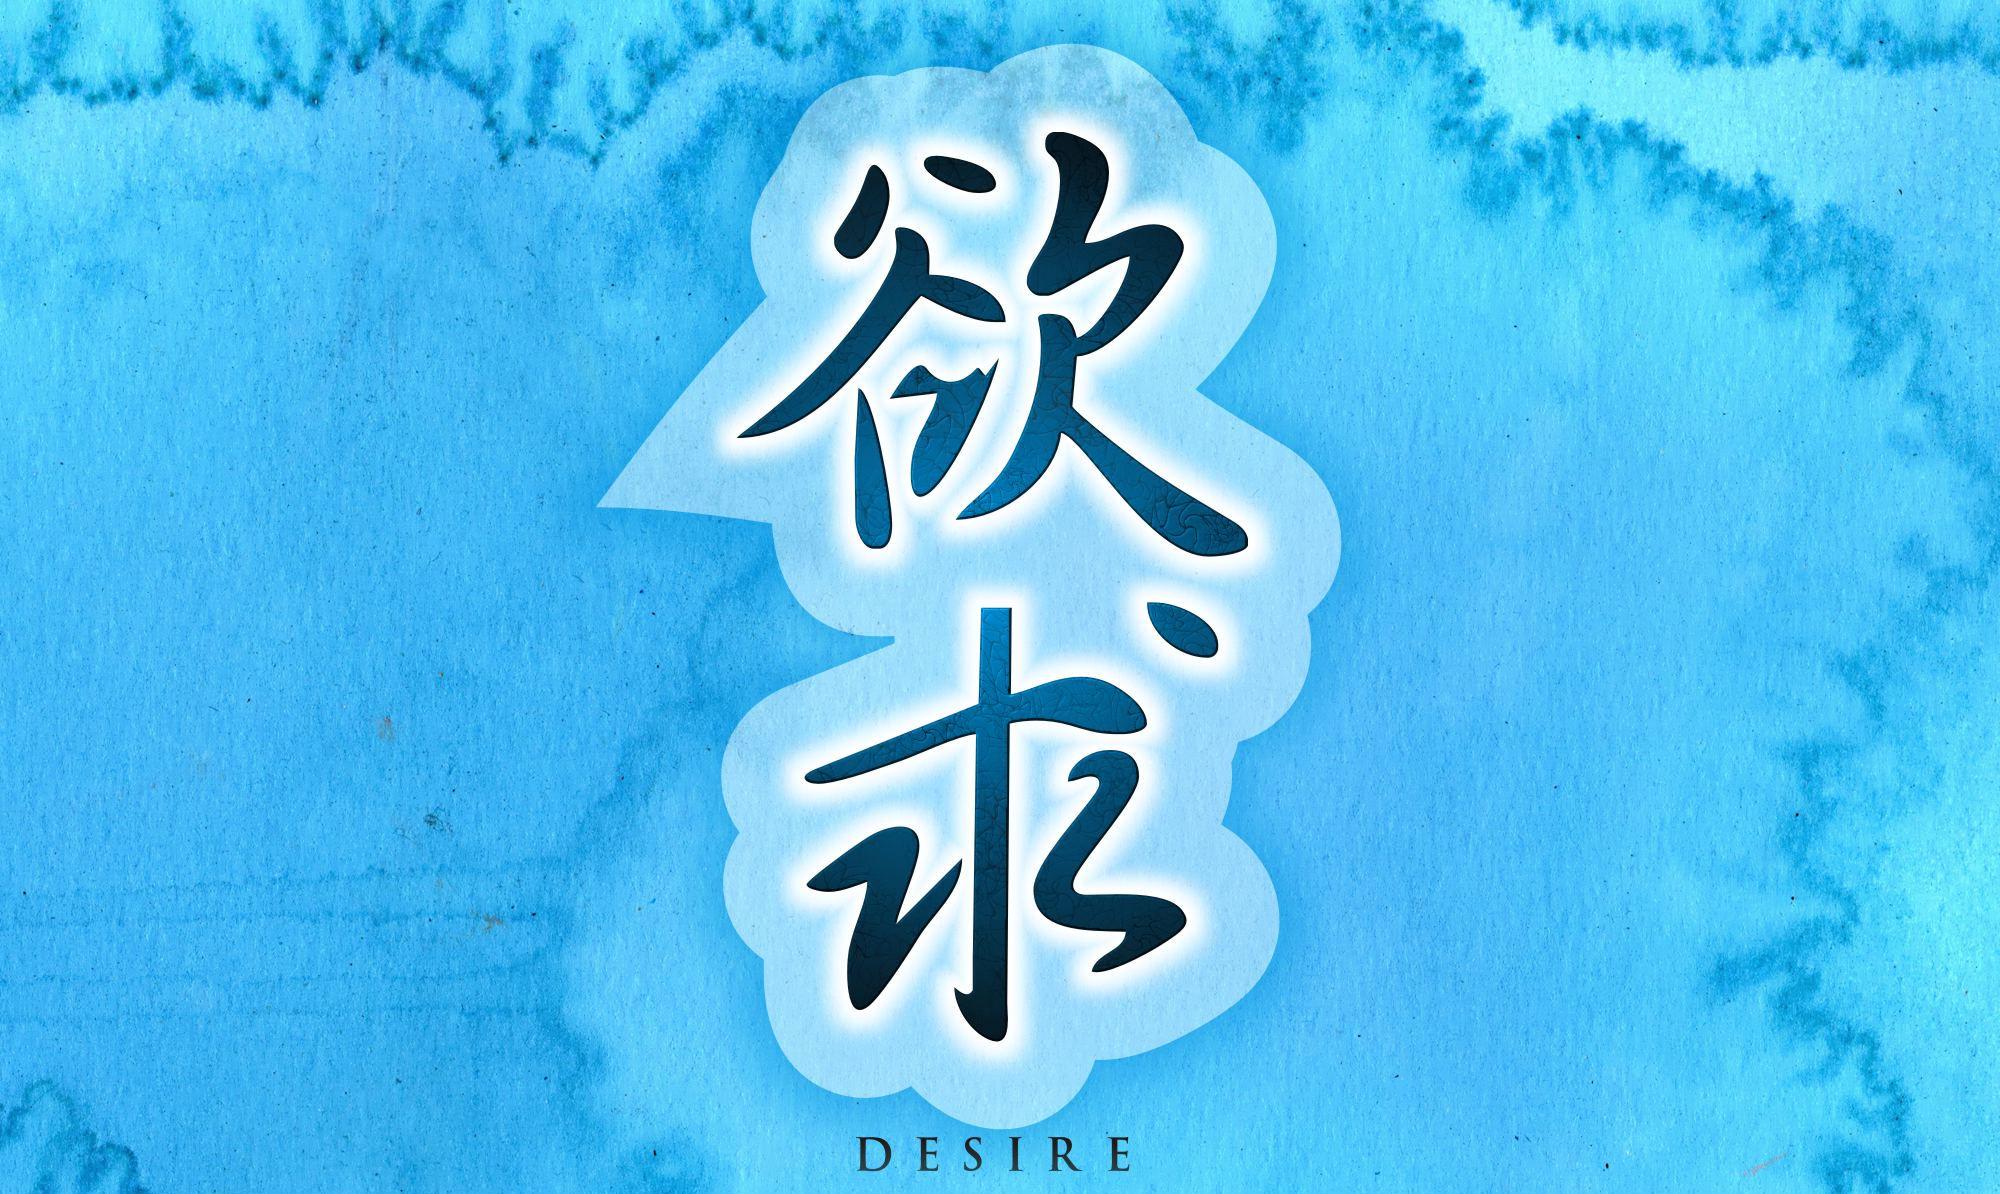 Desire In Japanese Handwriting Full Hd Wallpaper And